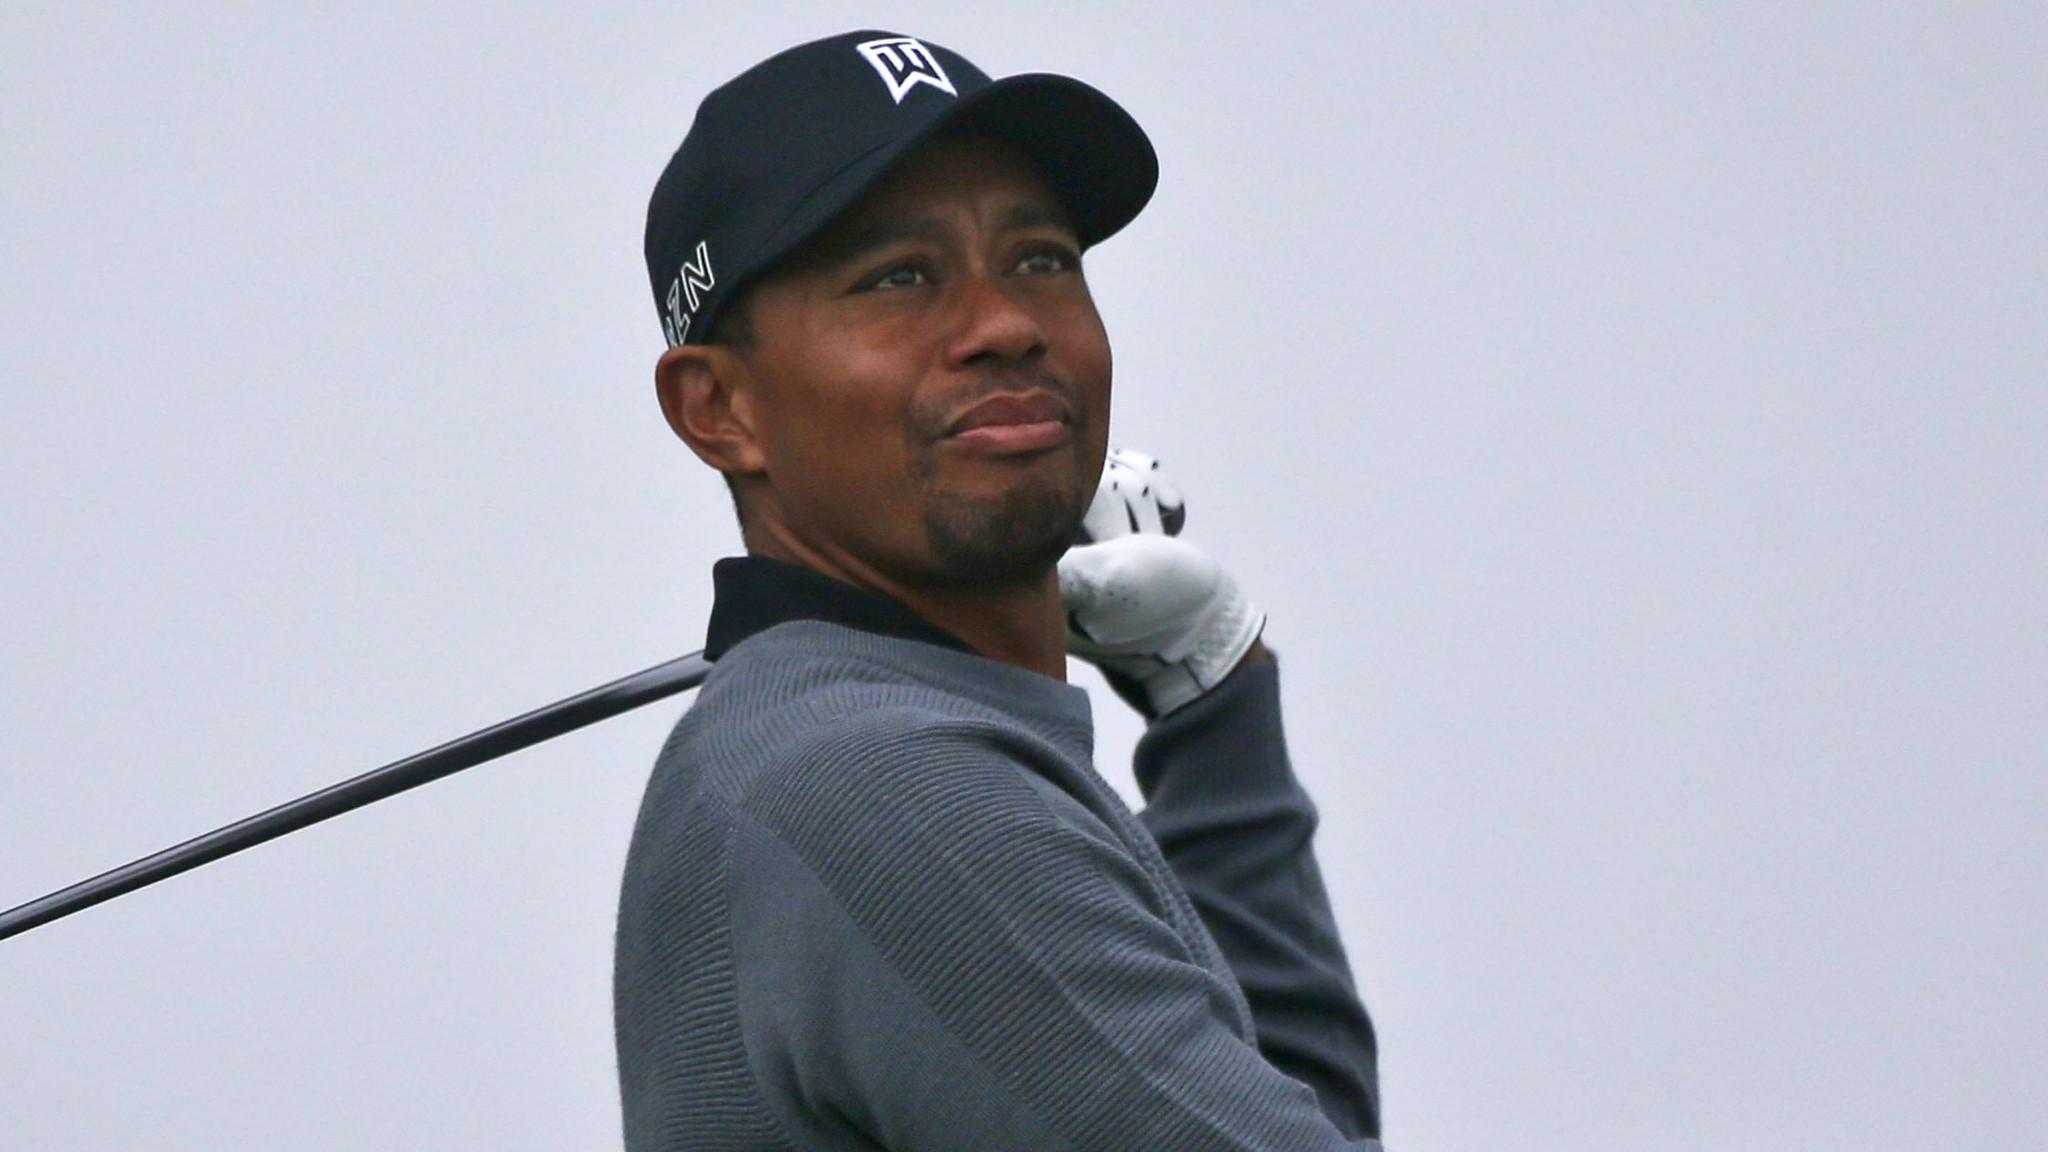 Tiger Woods Widescreen